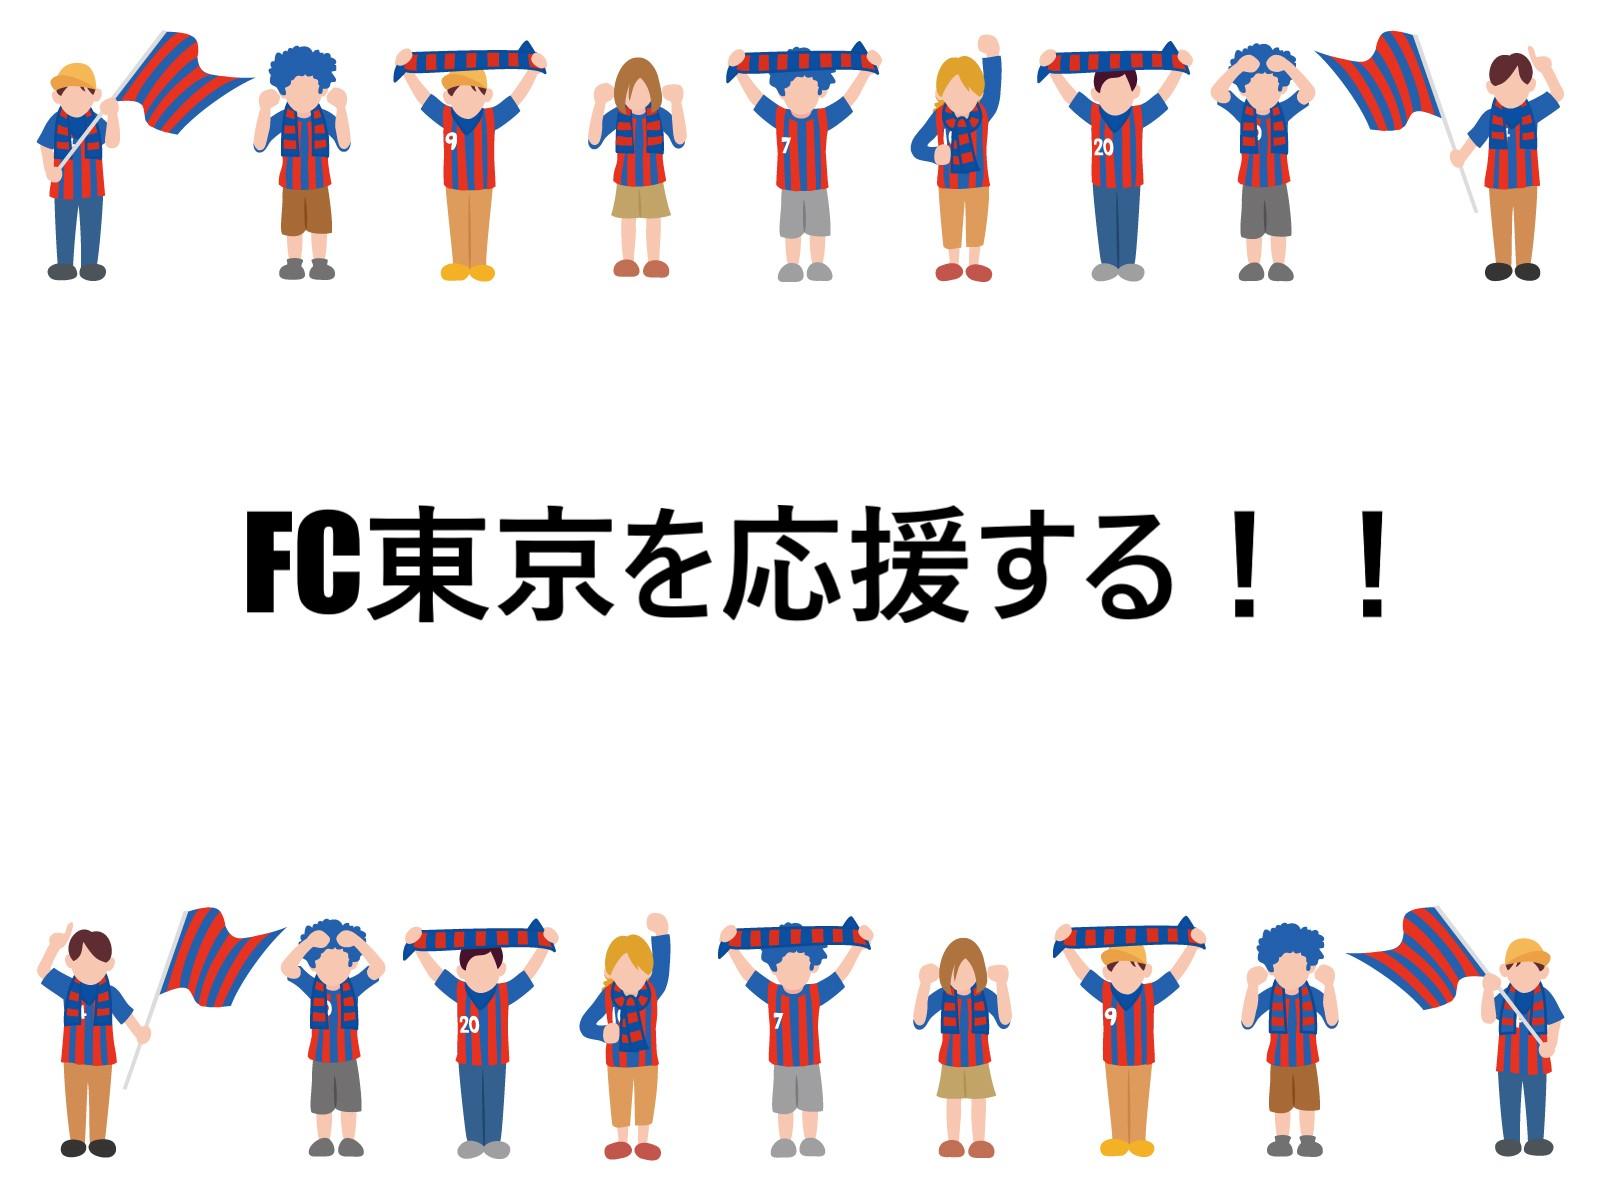 FC東京応援!!チケットはいくら?売り方は?DAZNの特典!公開練習でサイン!?